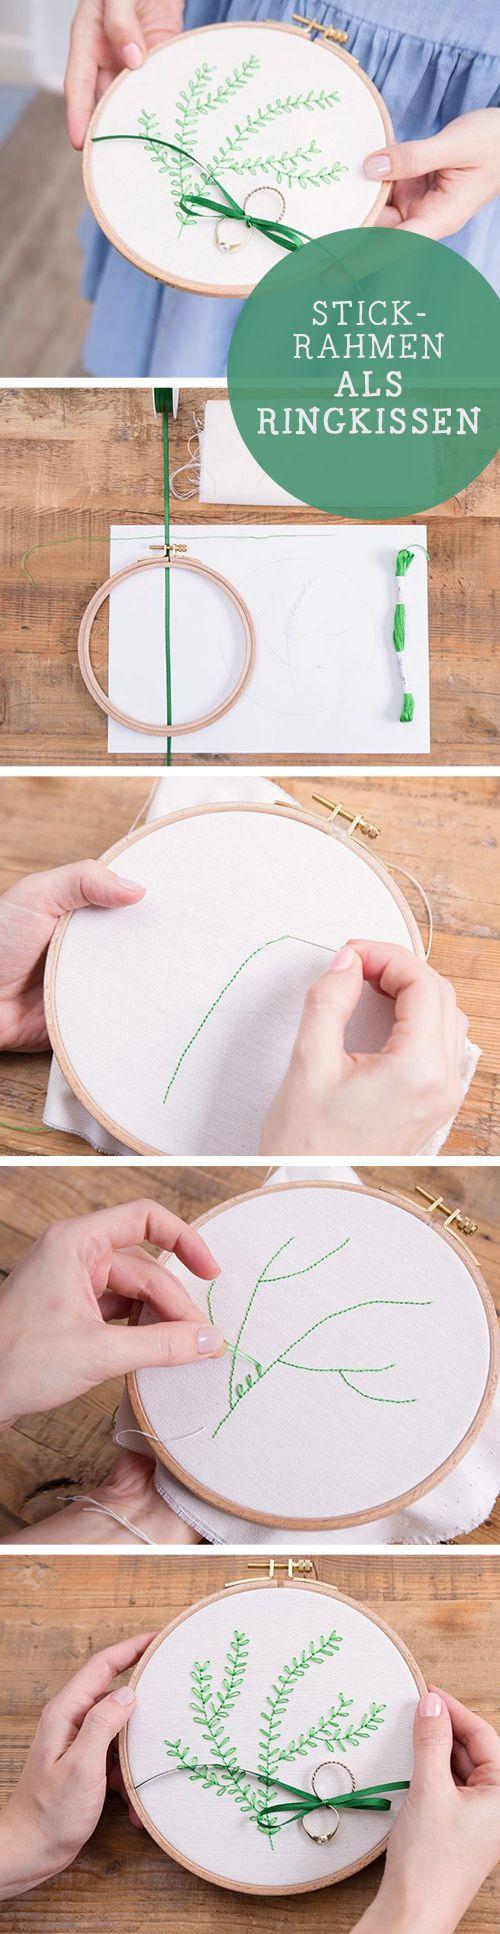 DIY-Tutorial: Ringkissen aus Stickrahmen herstellen, besticken / diy tutorial: embroidery ring cushion, wedding diy via DaWanda.com